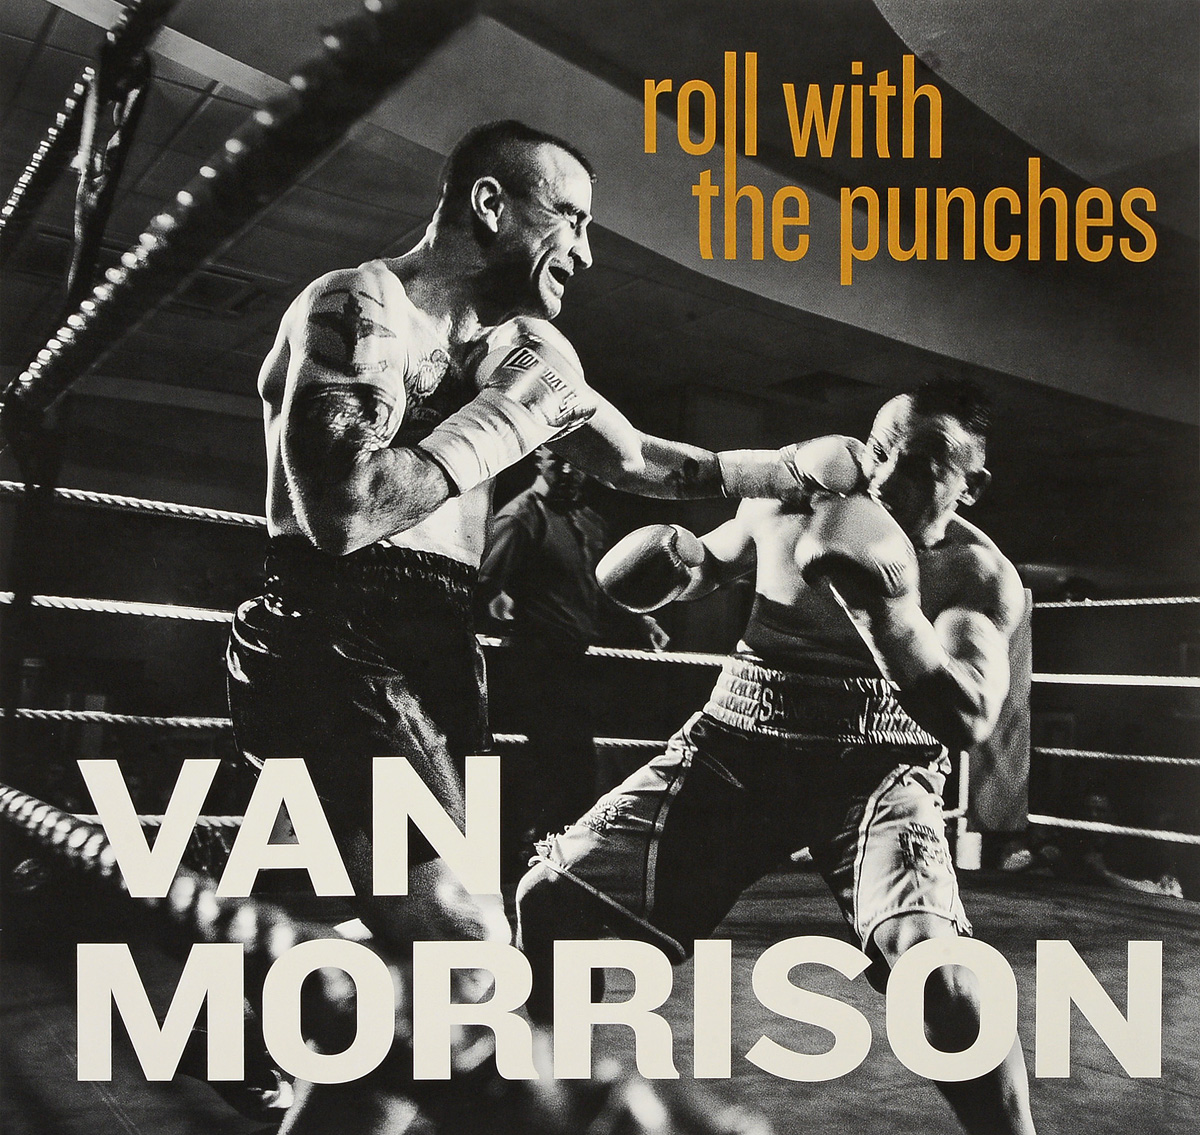 лучшая цена Ван Моррисон Van Morrison. Roll With The Punches (2 LP)